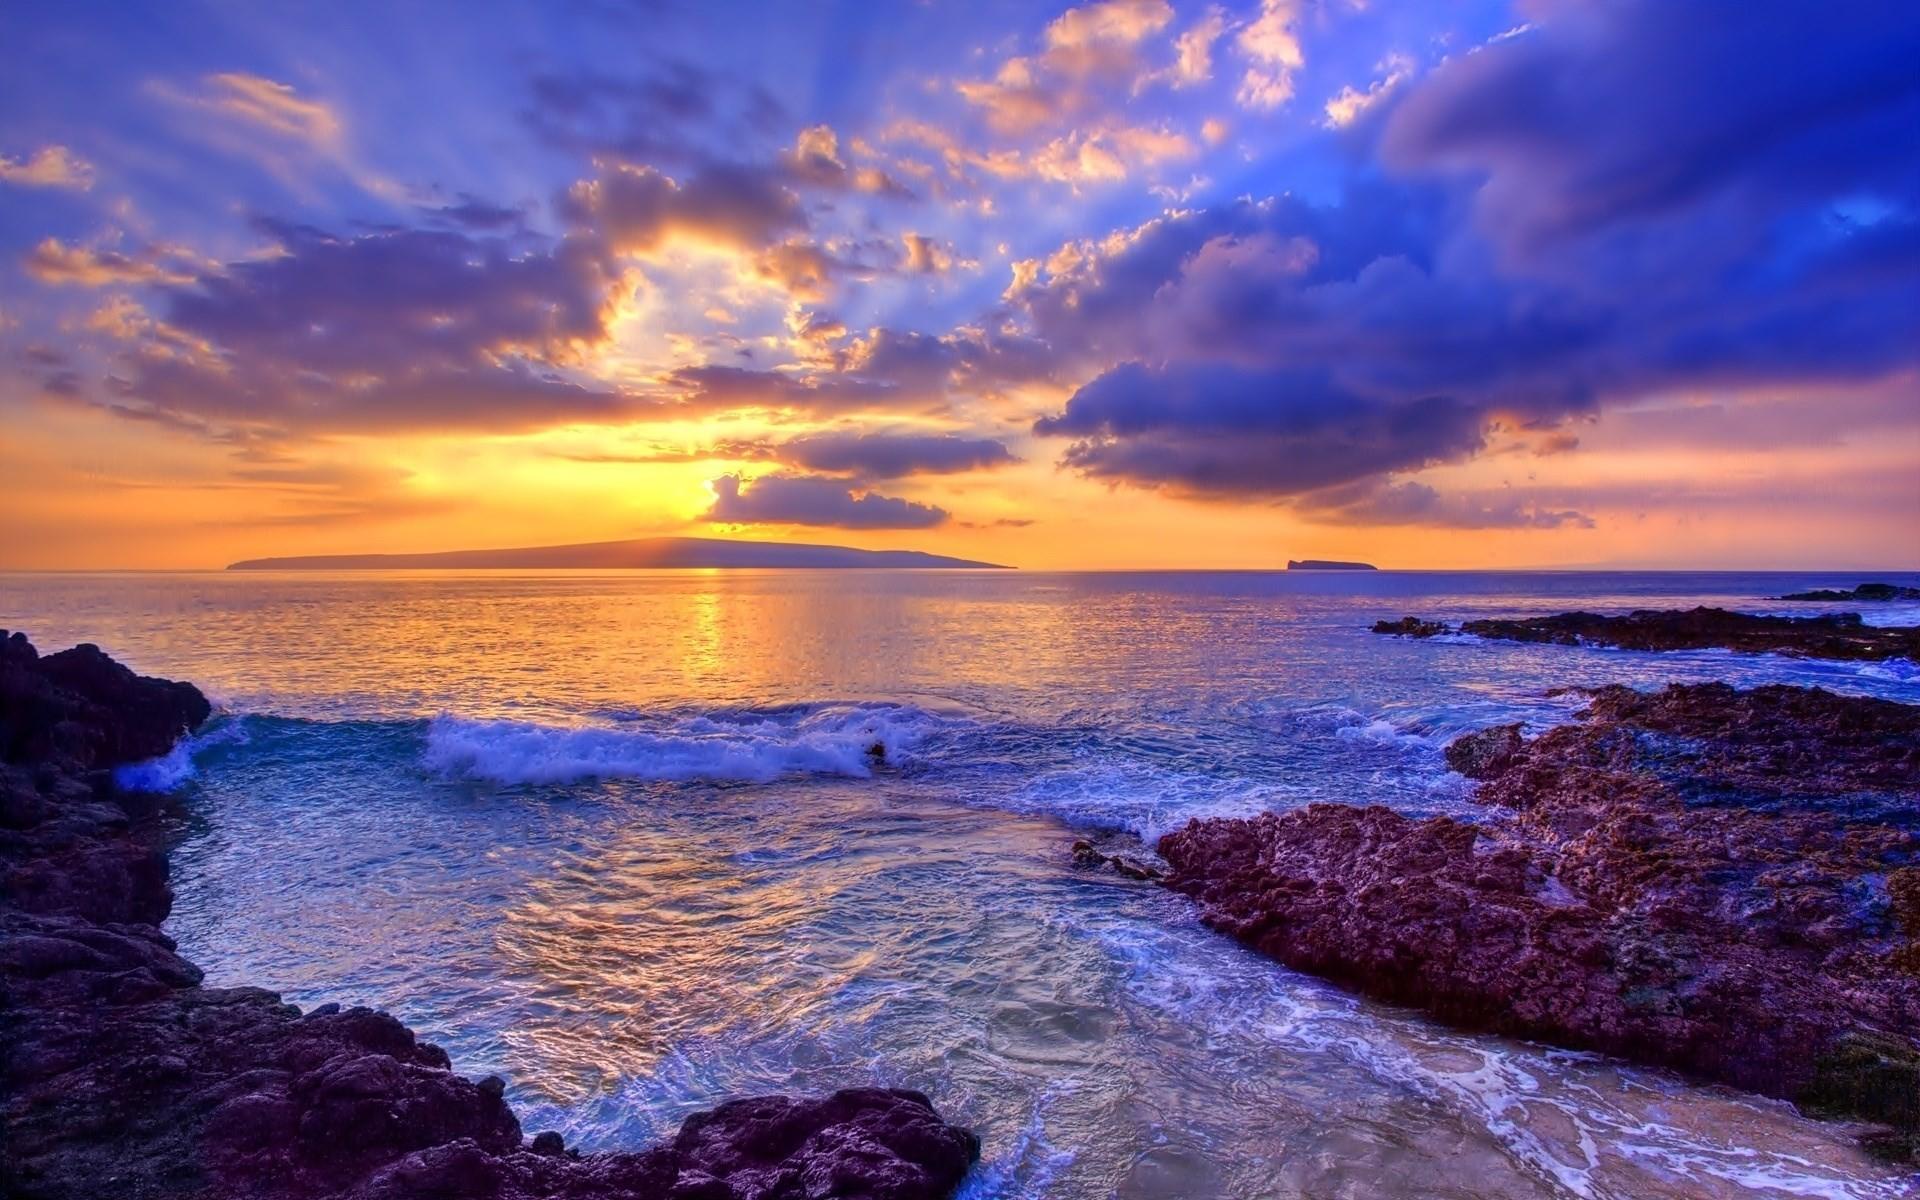 ocean backround